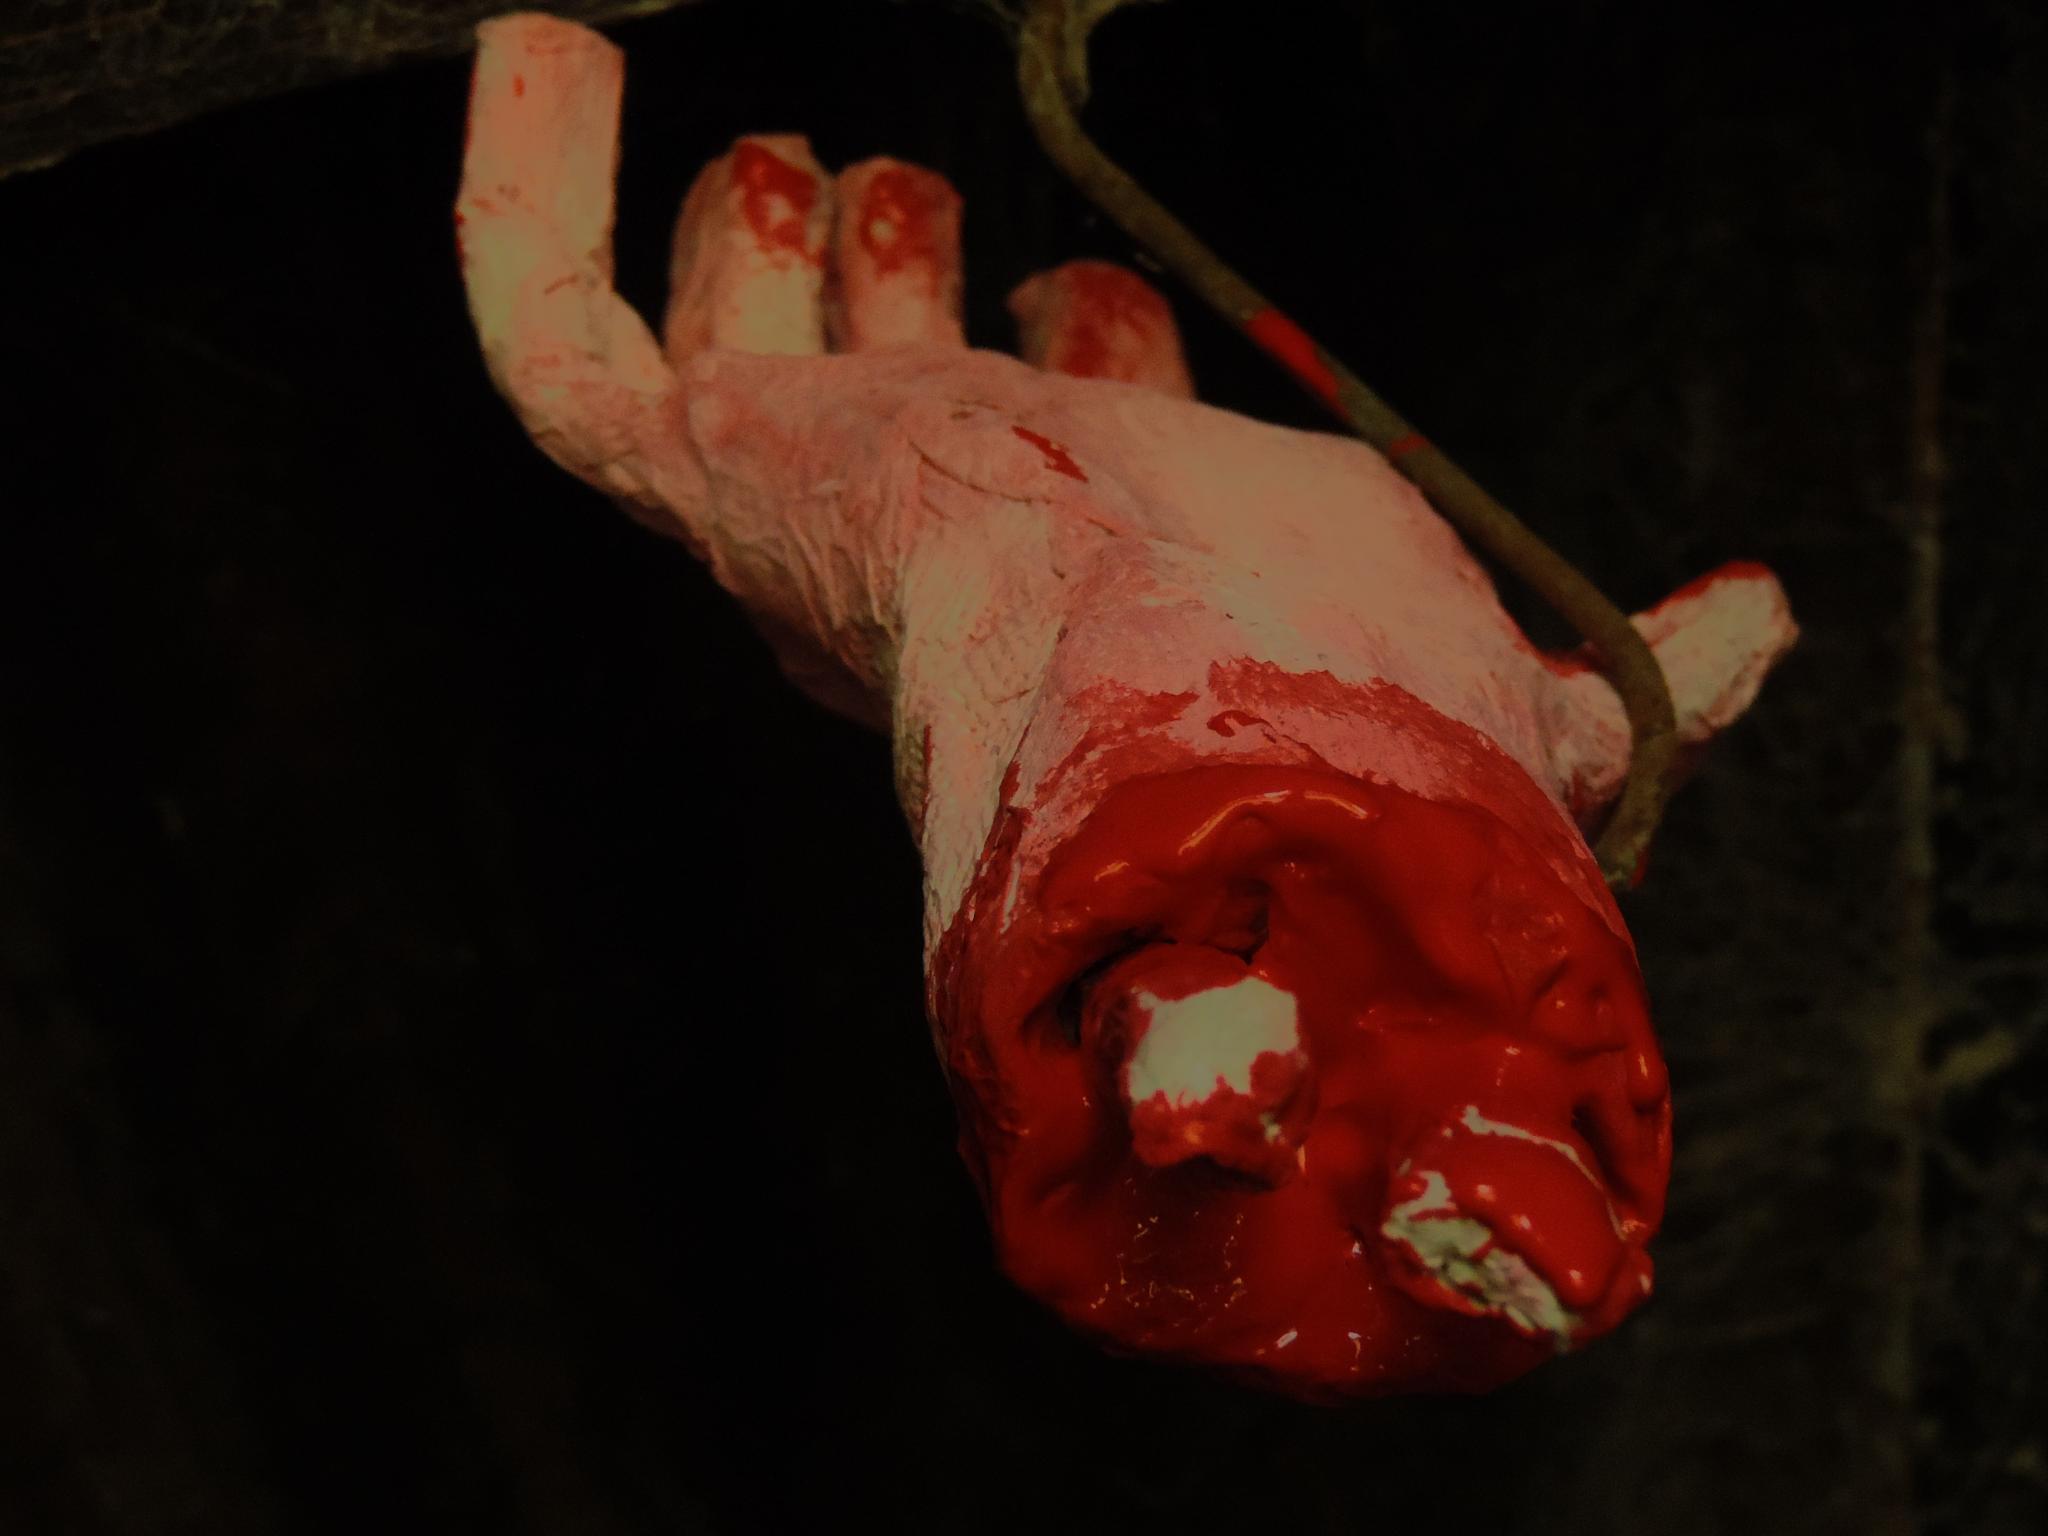 Lost Hand - Halloween Night by Tomas Del Castillo